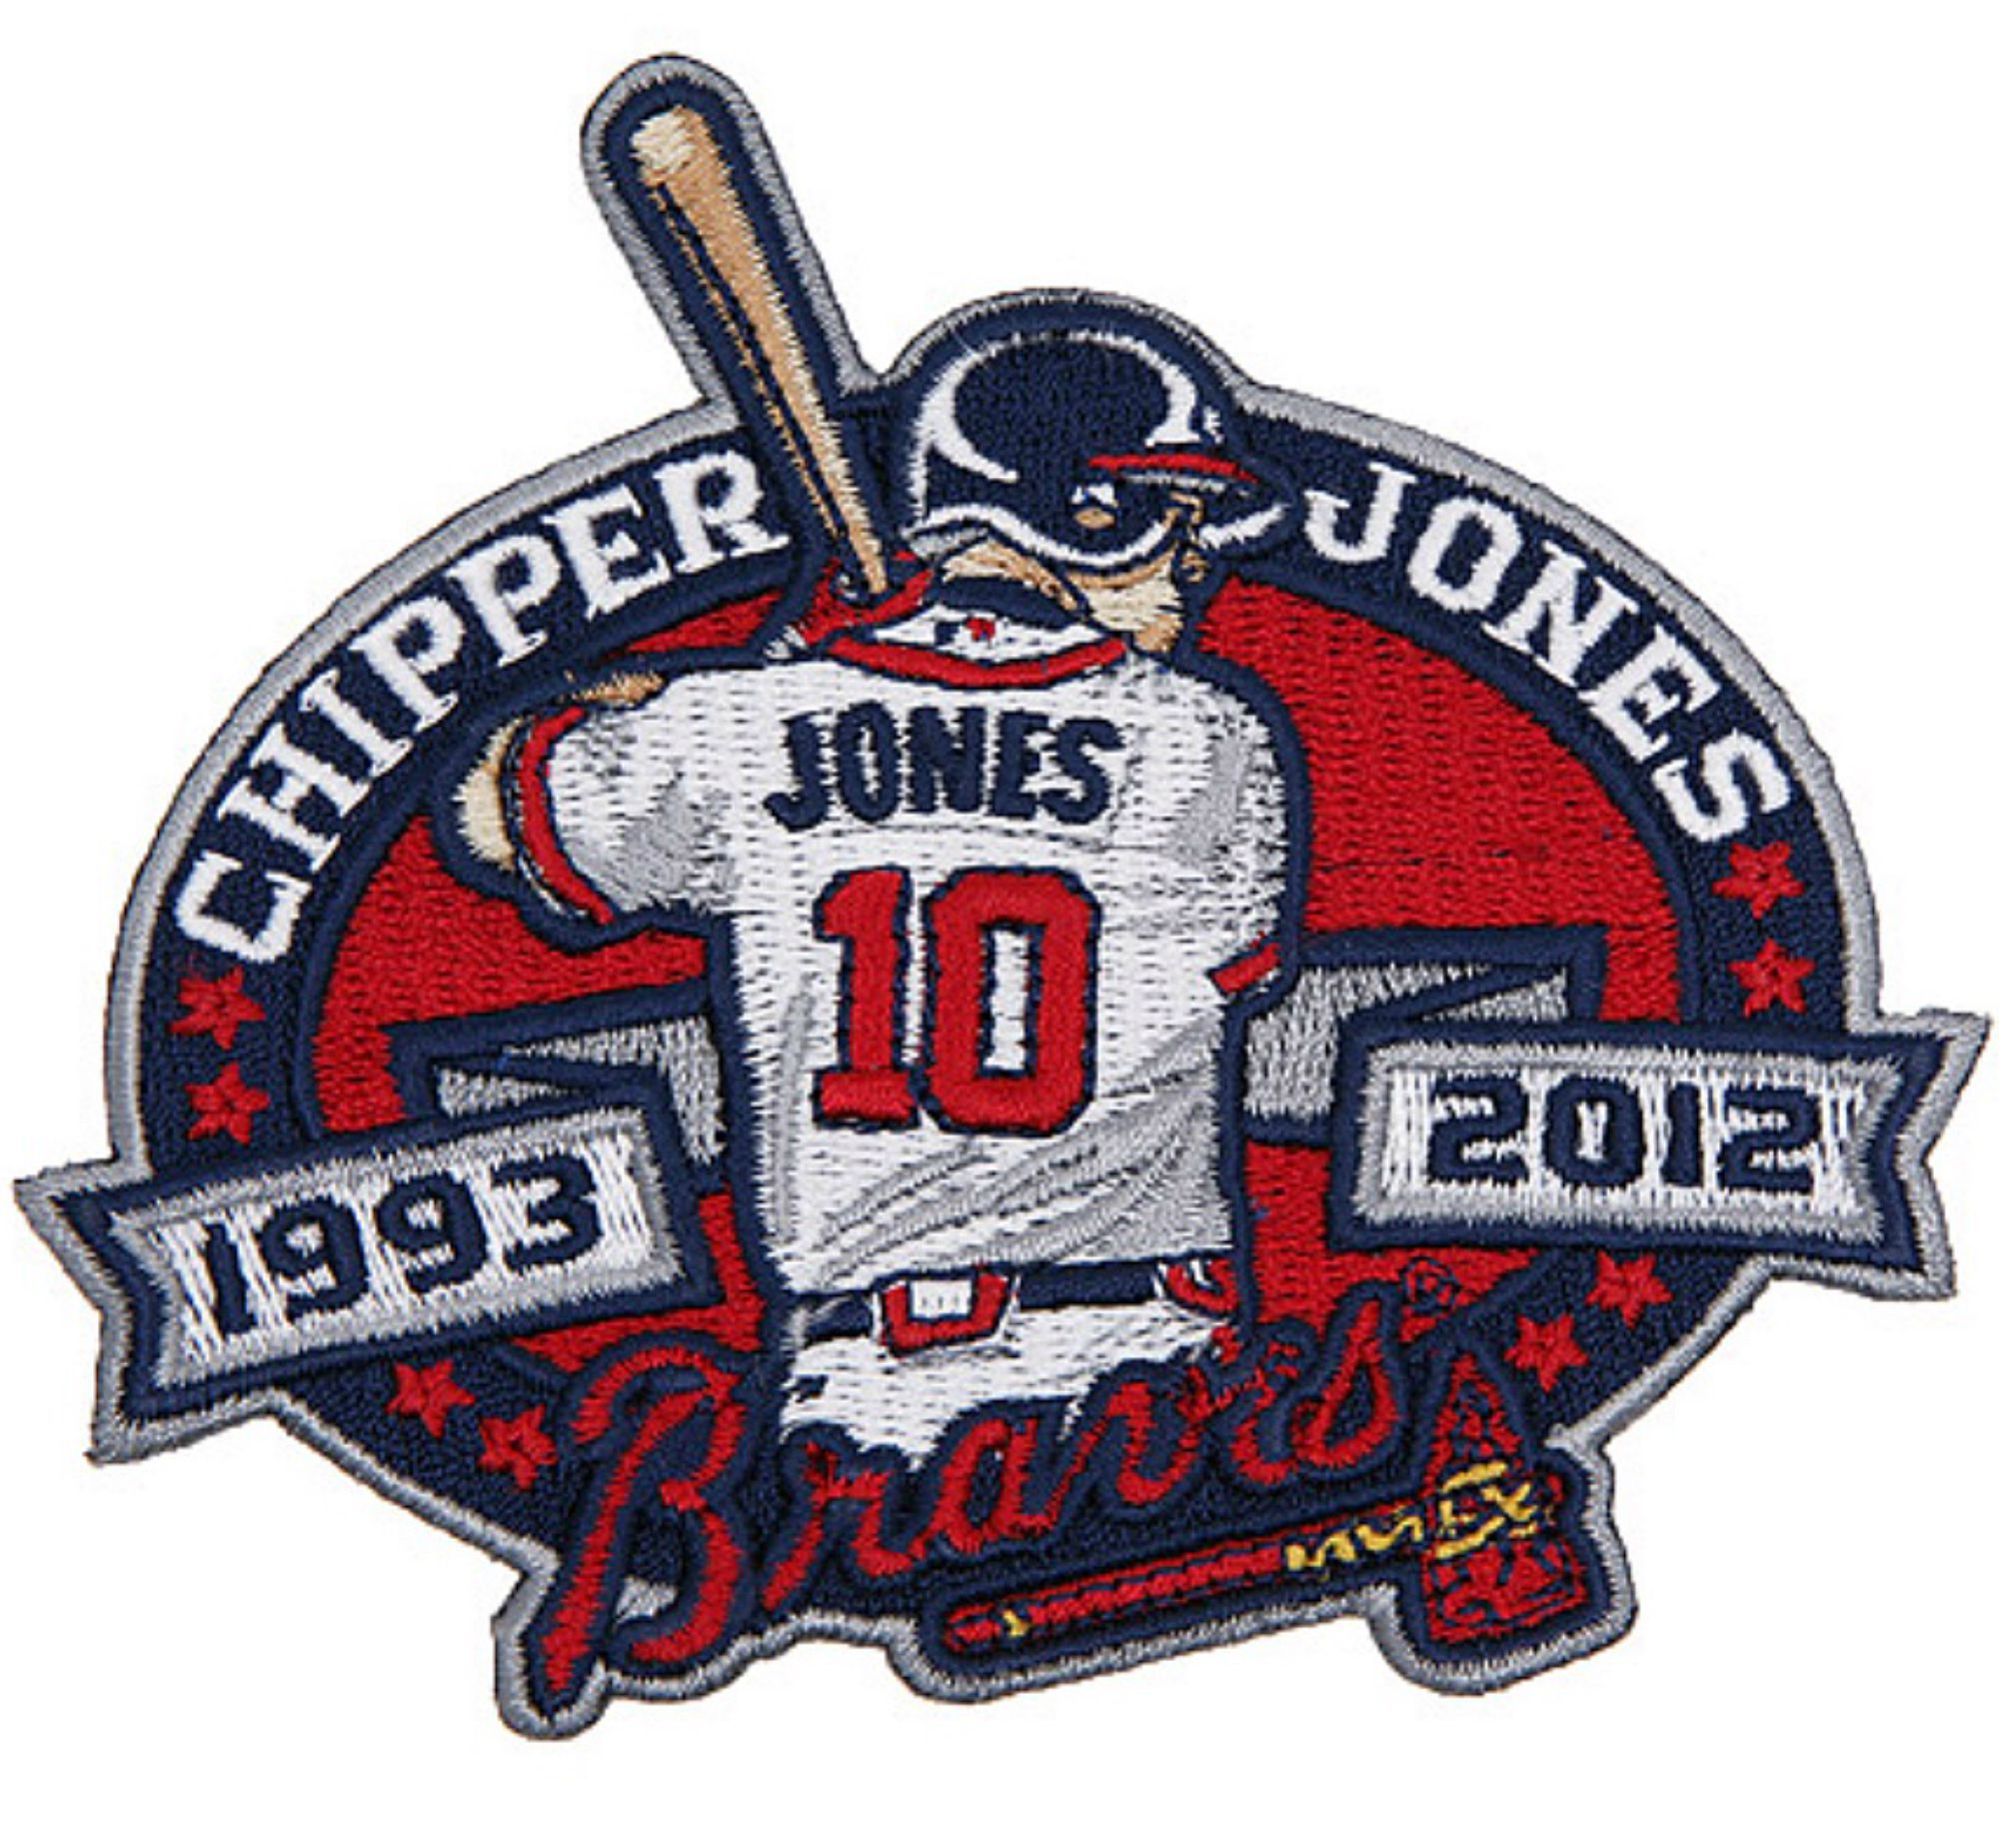 Chipper Jones Jersey Patch Chipper Jones Atlanta Braves Braves